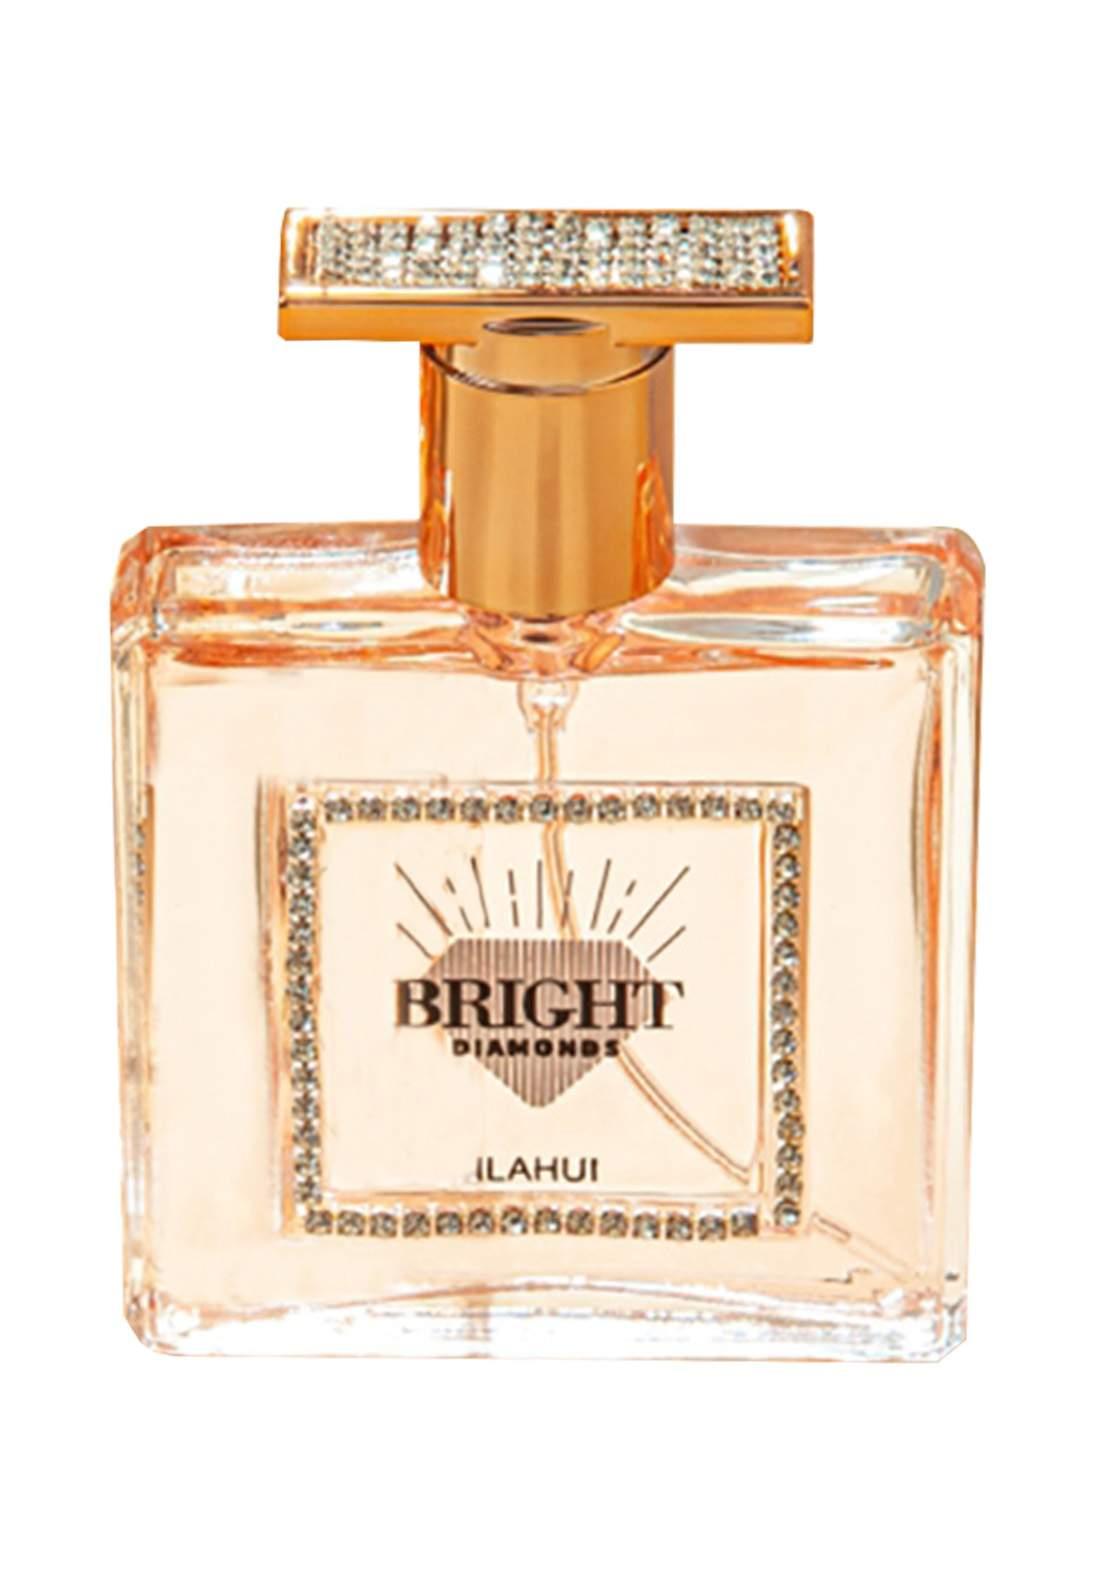 Ilahui Bright Dimonds Perfume 40ml عطر نسائي